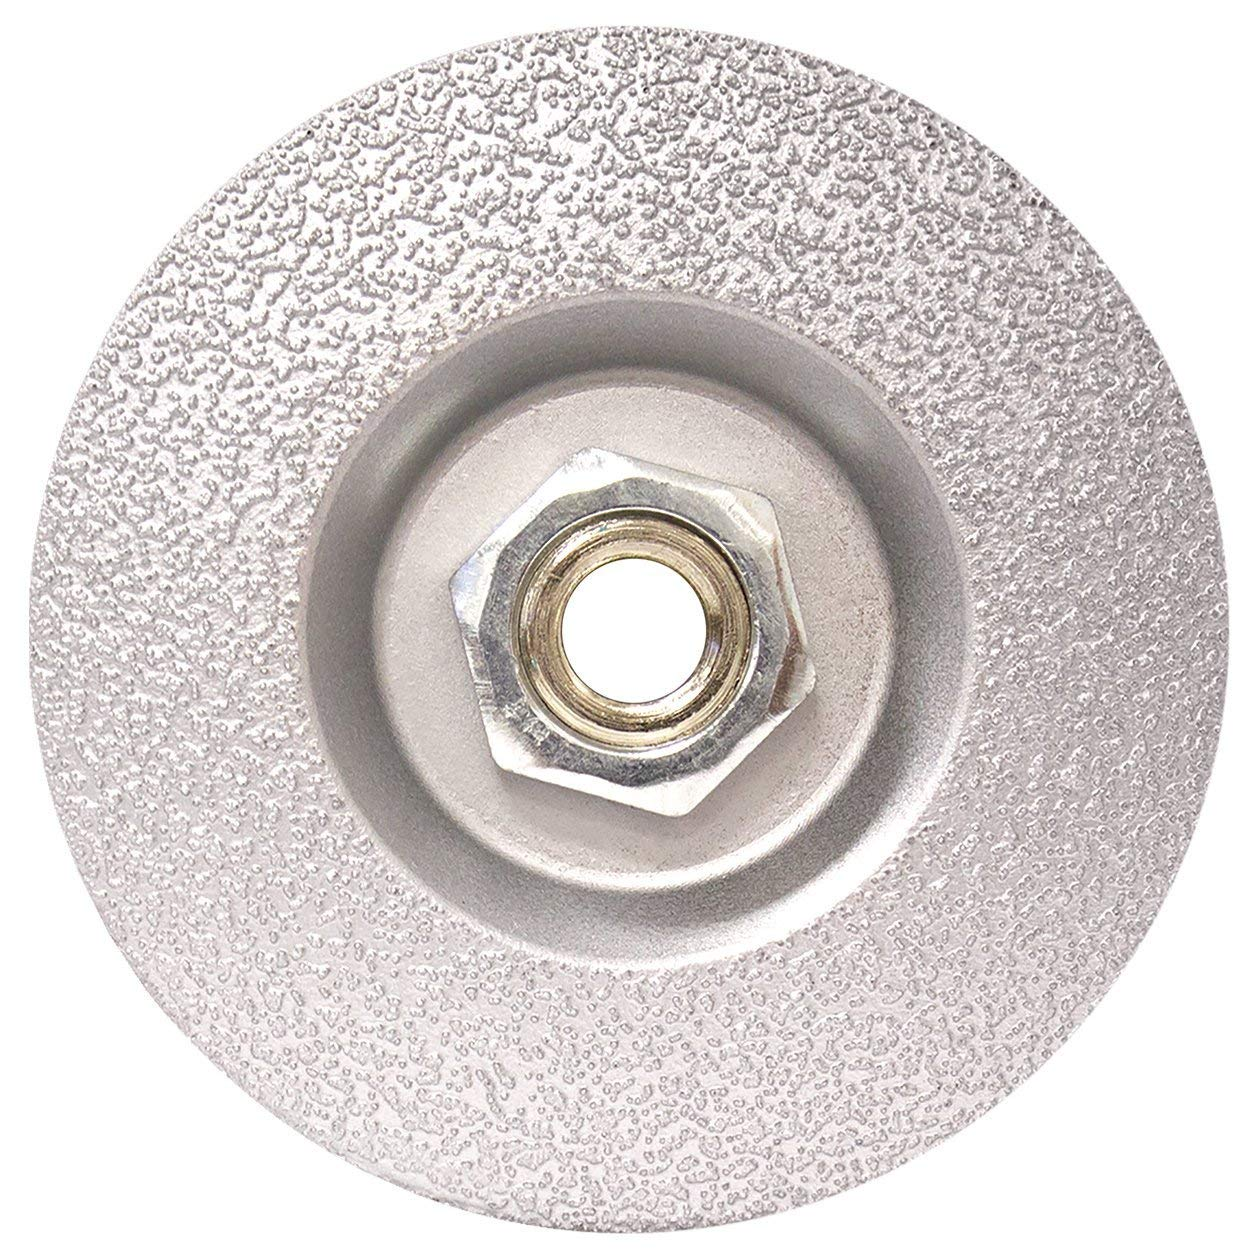 12000 RPM 98 Units 2 in Disc Dia Aluminum Oxide Non-Woven Finishing Disc